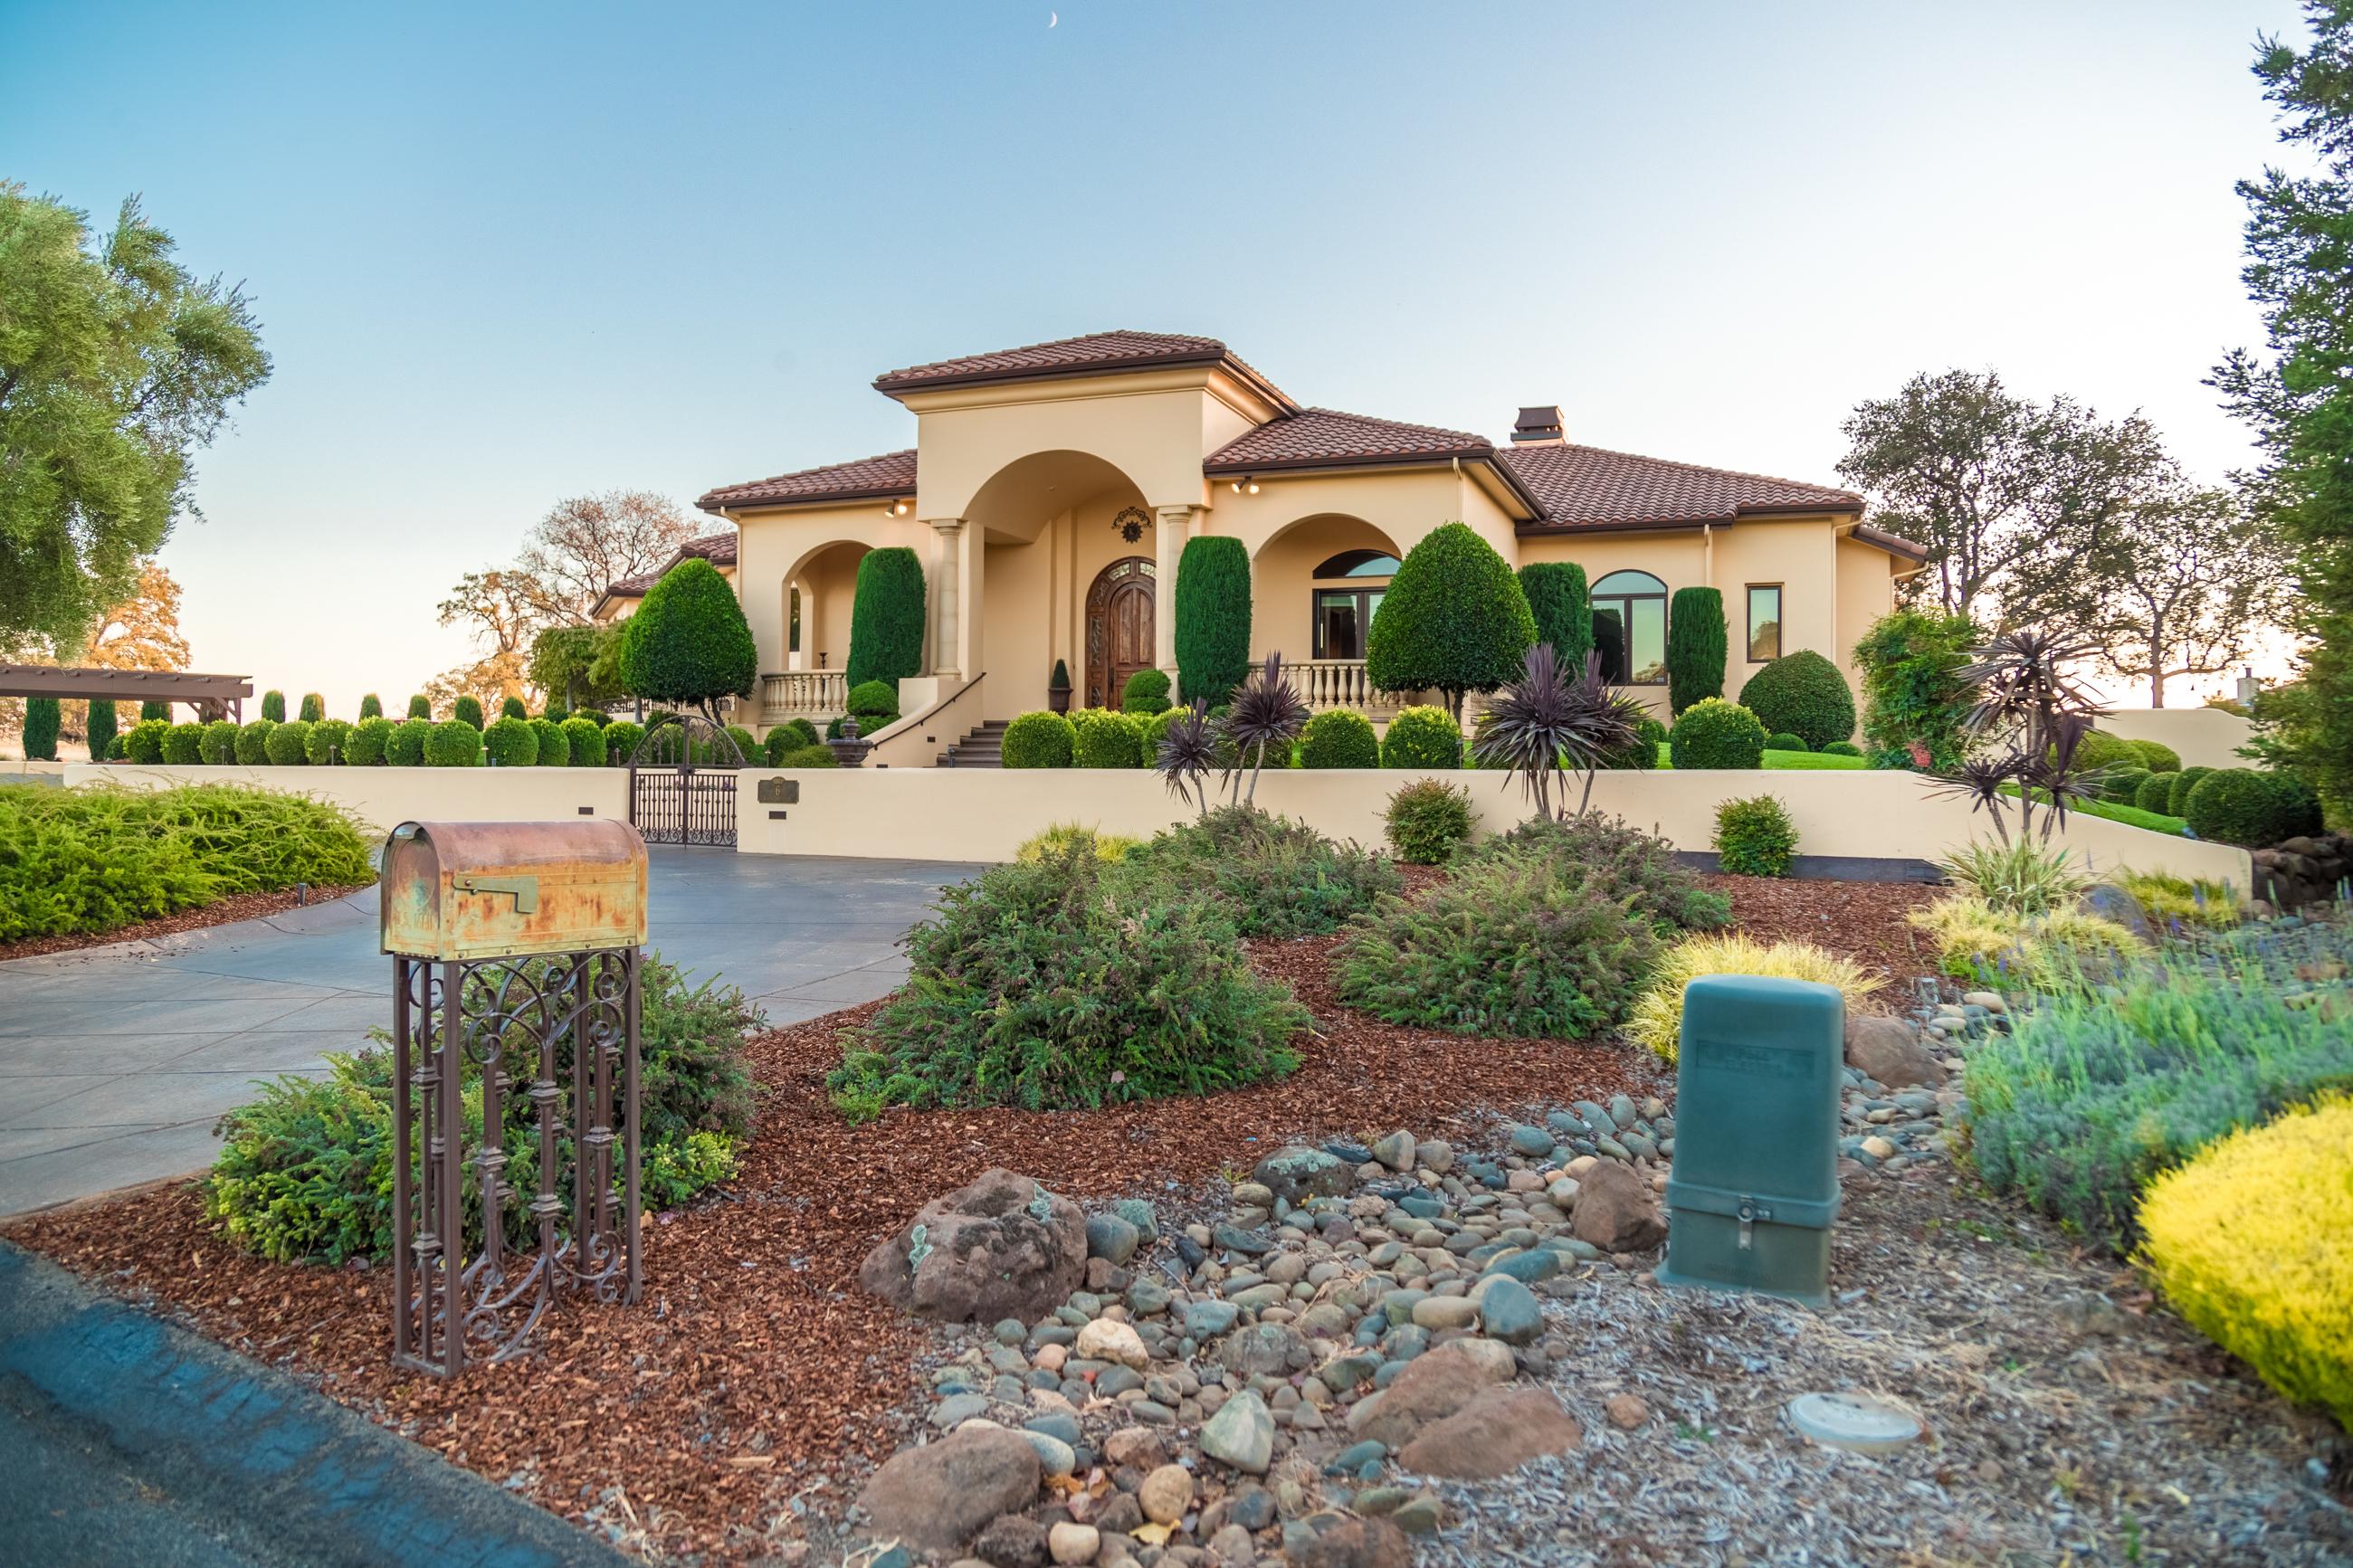 photography portfolio example - exterior of large luxury home